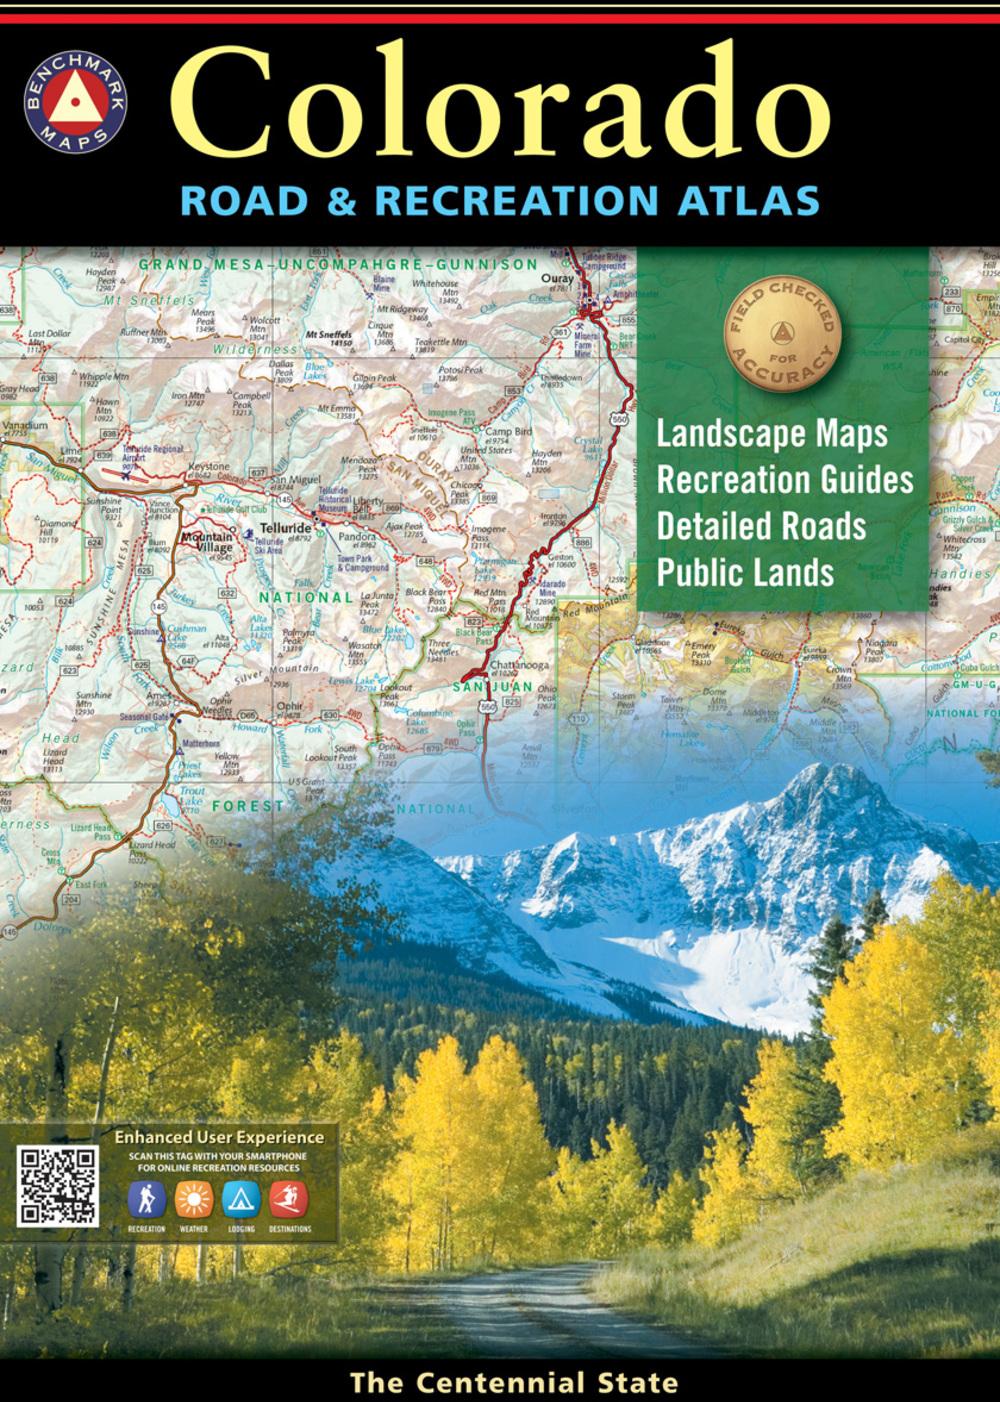 ColoradoACLjpg - Washington dc popout map